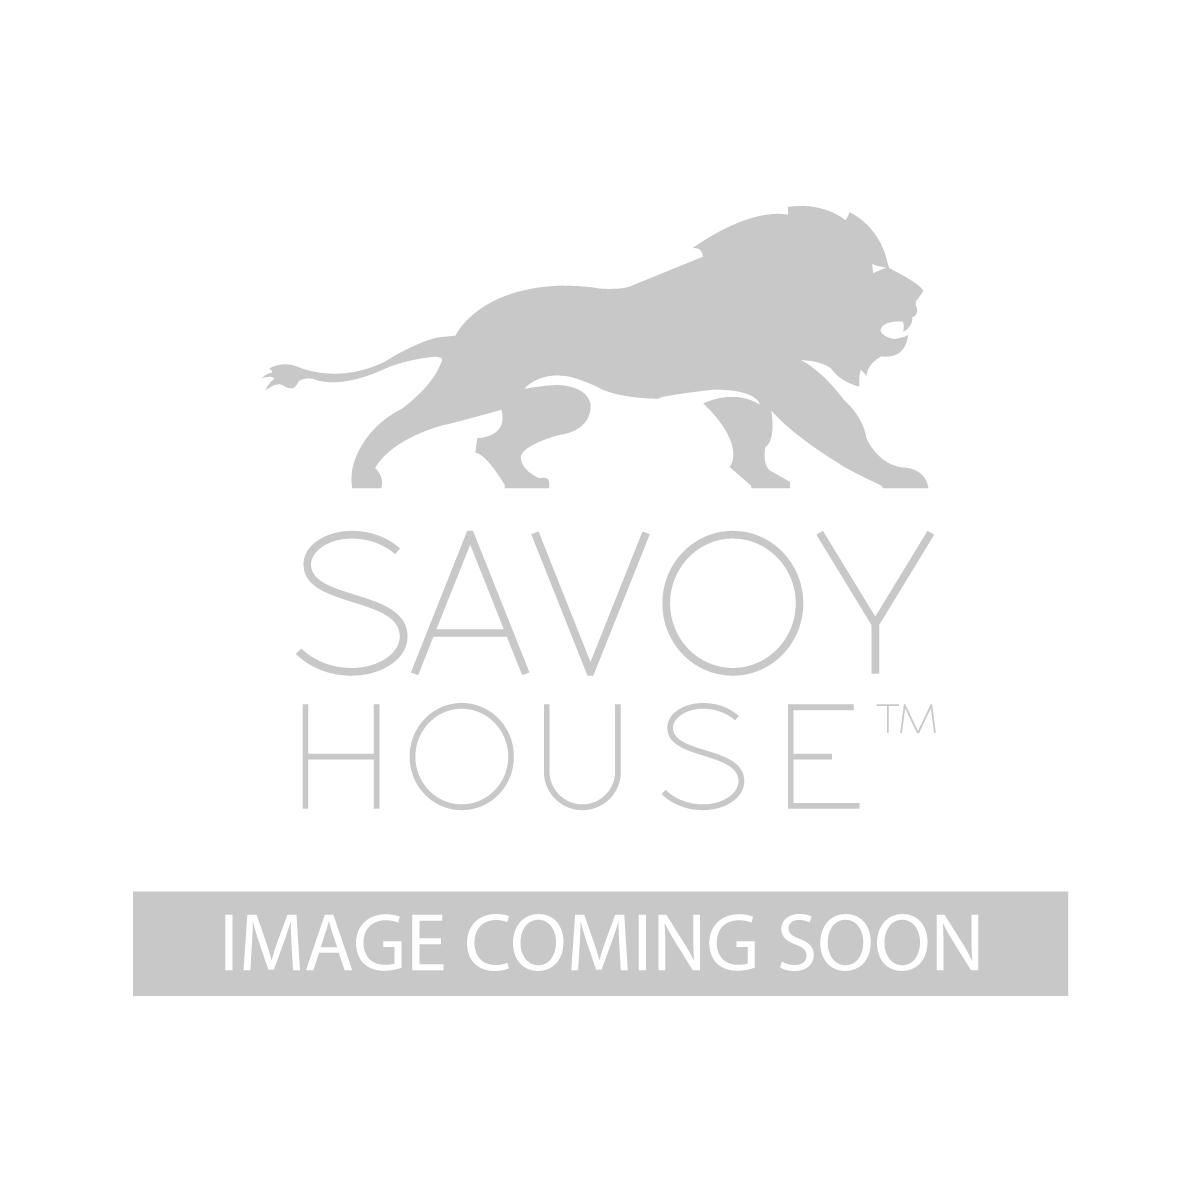 11264 Bn Flush Mount By Savoy House